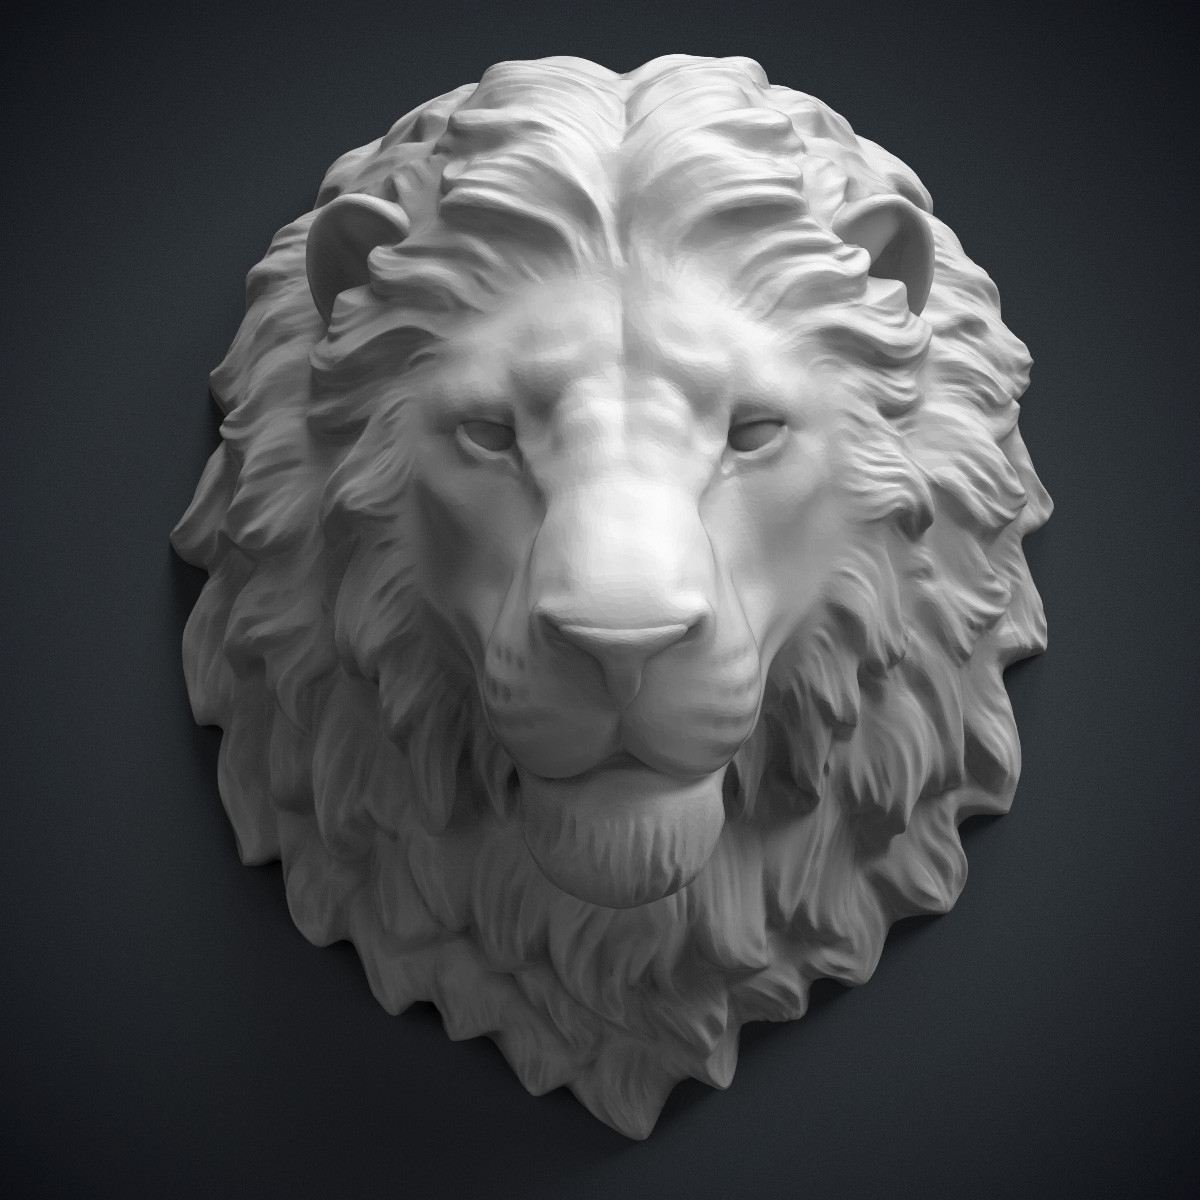 calm-lion-head-3d-model-01.jpg